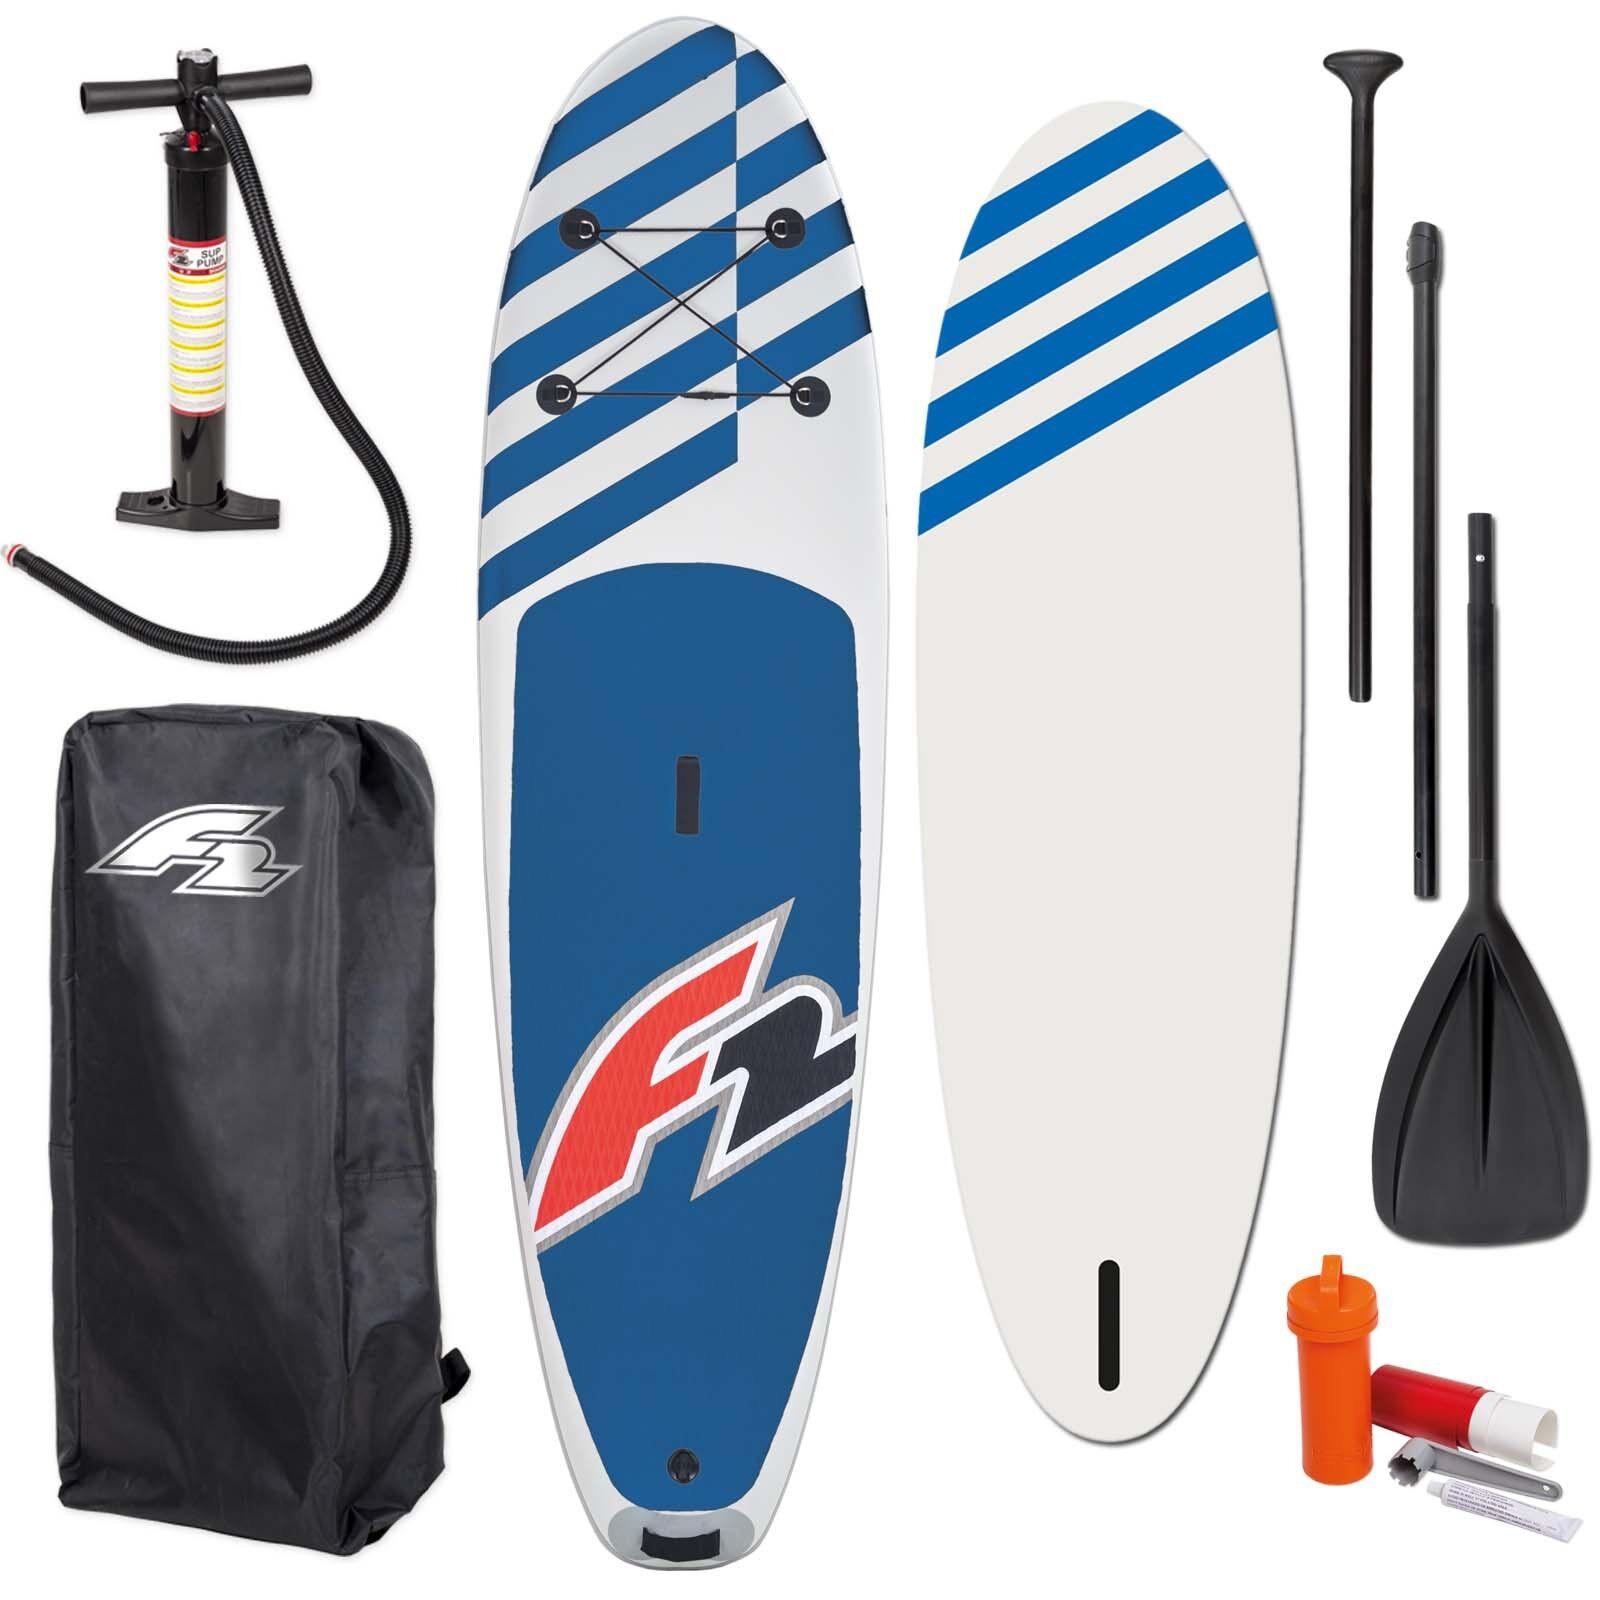 F2 Tabla Surf de Remo Sup 10,6  azul Set Completo Hinchable Hinchable